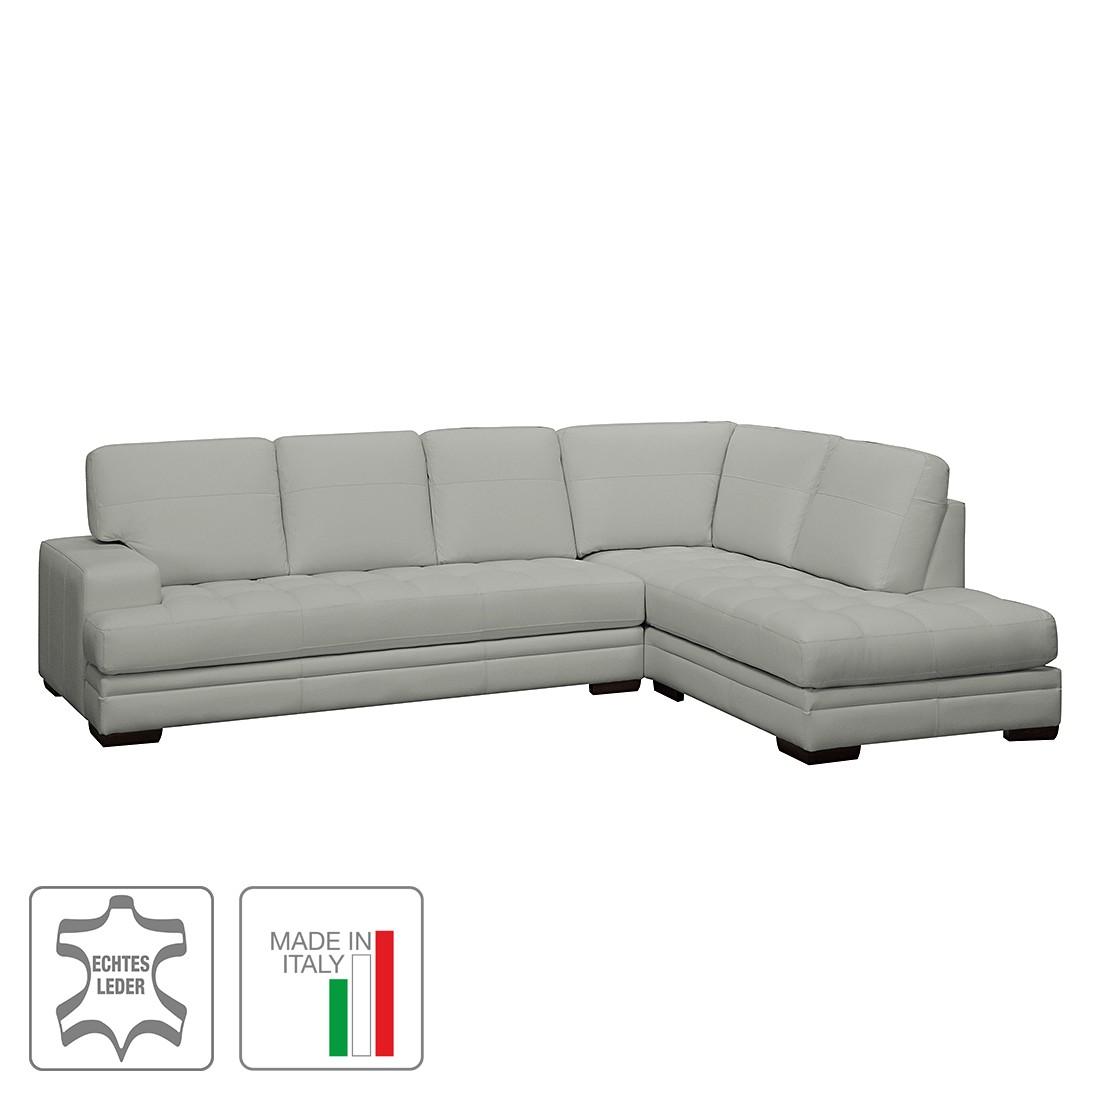 ecksofa trapuntato echtleder longchair ottomane davorstehend rechts grau trend italiano. Black Bedroom Furniture Sets. Home Design Ideas